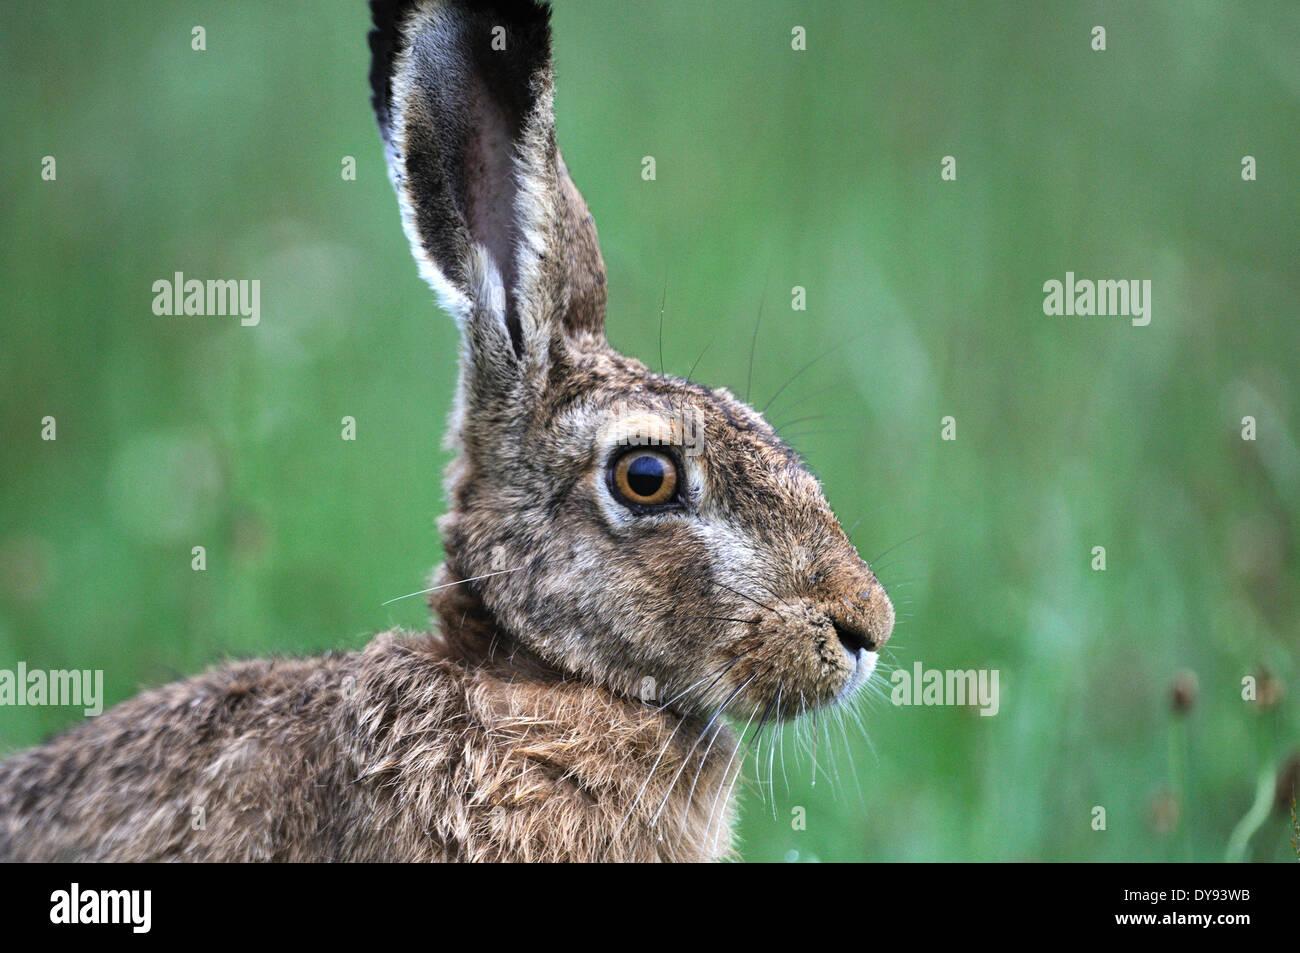 Lièvre, lapin, Lepus europaeus Pallas, brown hare, bunny, herbe, portrait, animal, animaux, France, Europe, Photo Stock